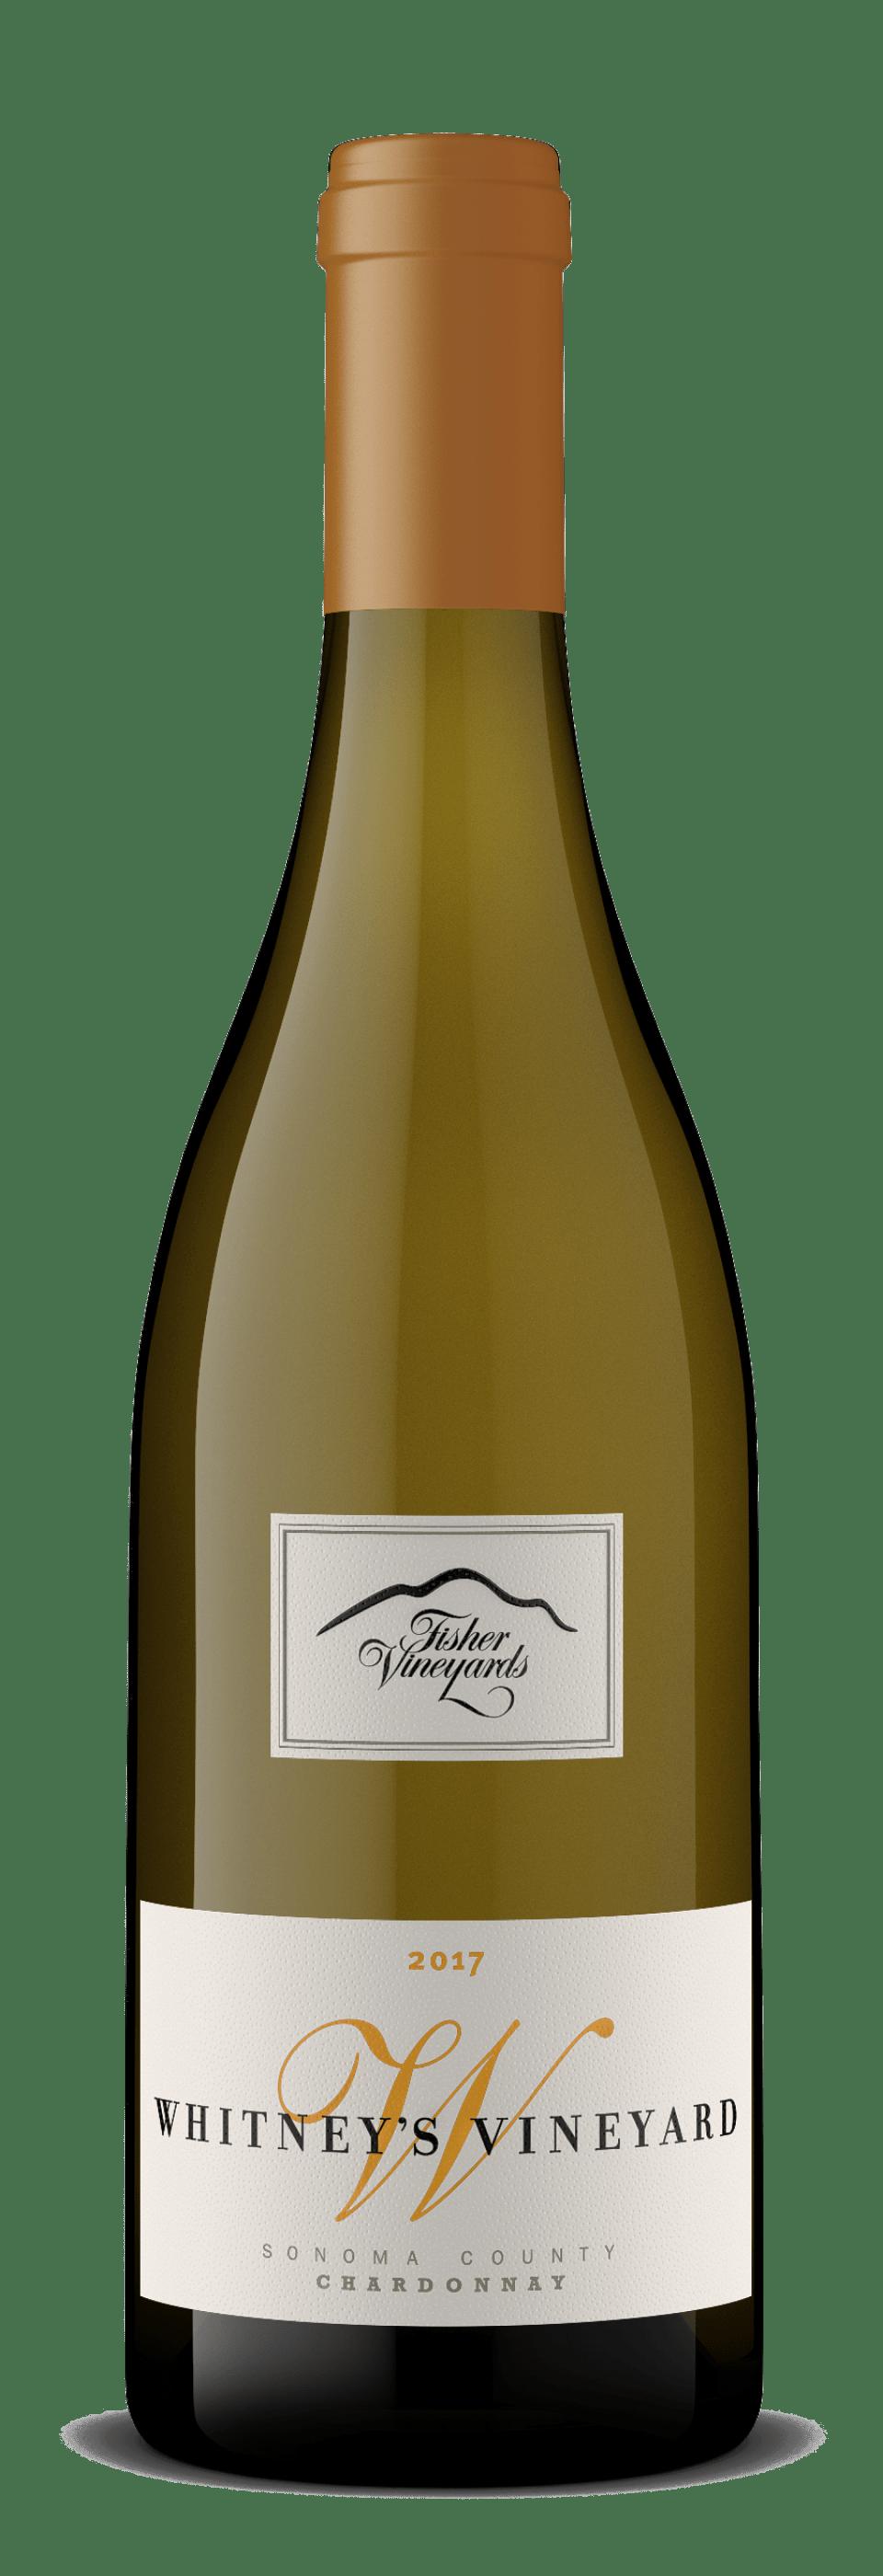 2018 Whitney's Vineyard